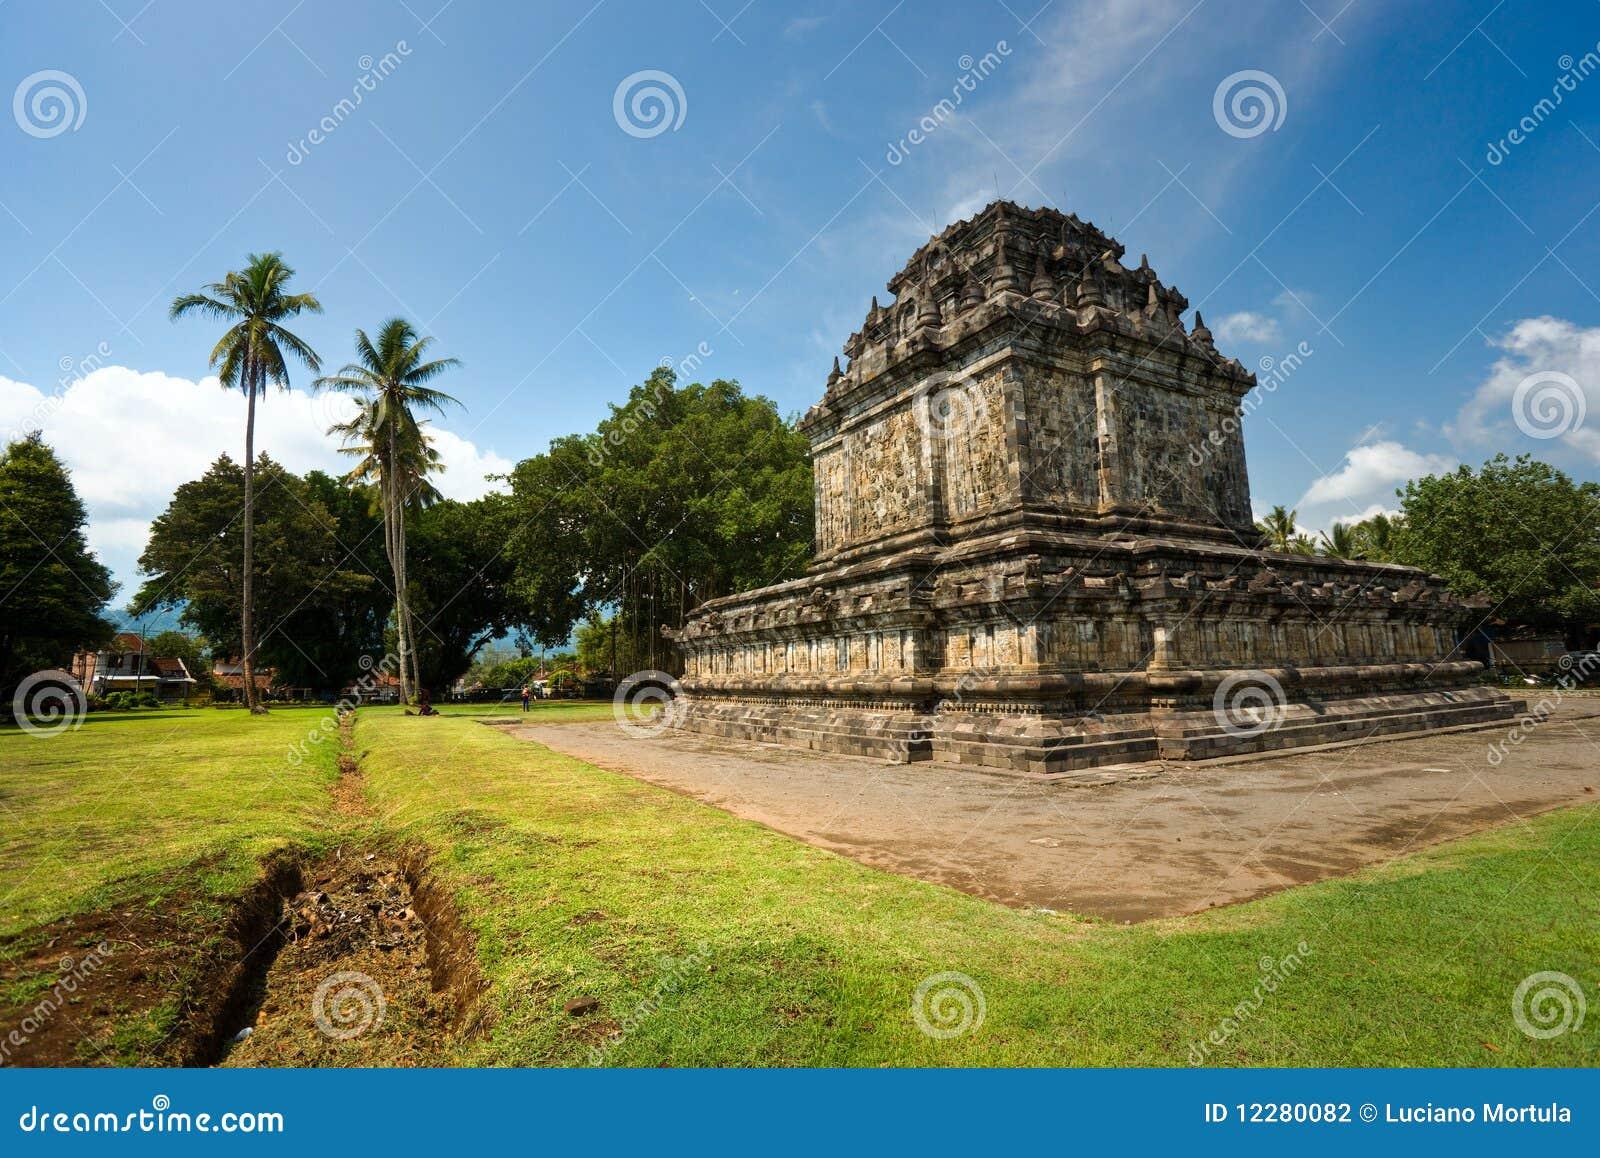 Yogyakarta Indonesia  city photos : Candi Mendut, Yogyakarta, Indonesia. Stock Photography Image ...